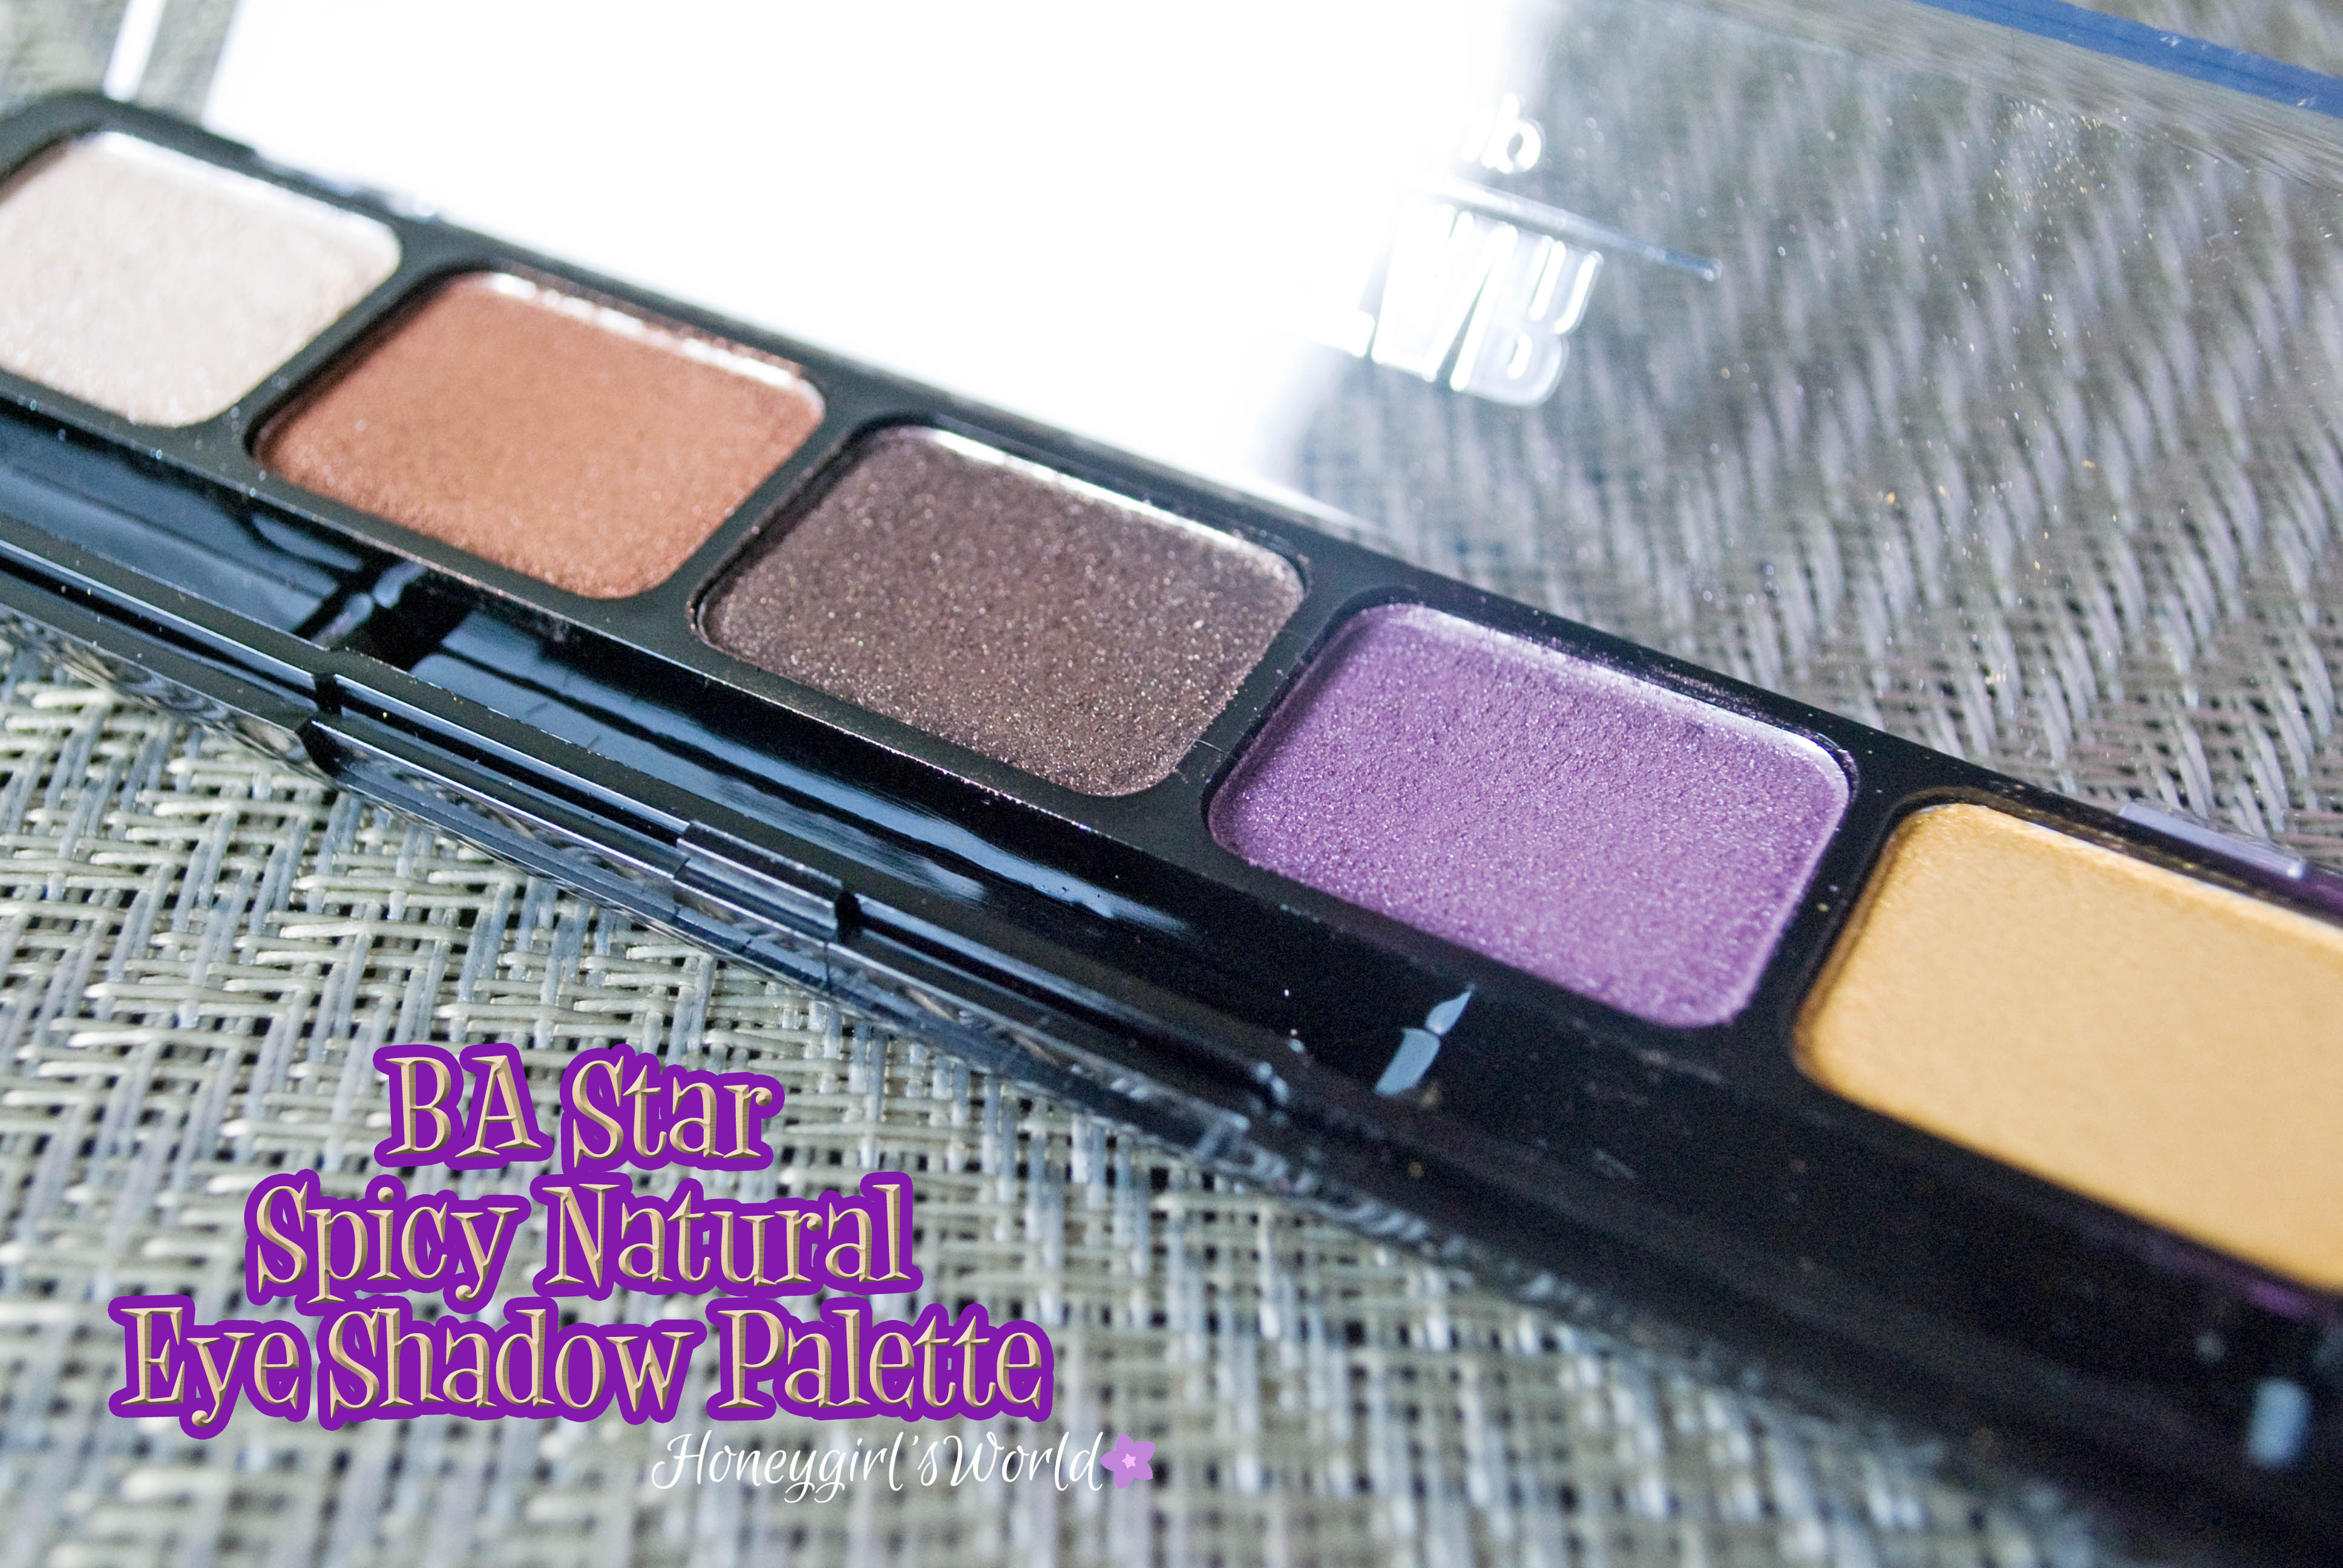 BA Star Eye Shadow Palette Natural